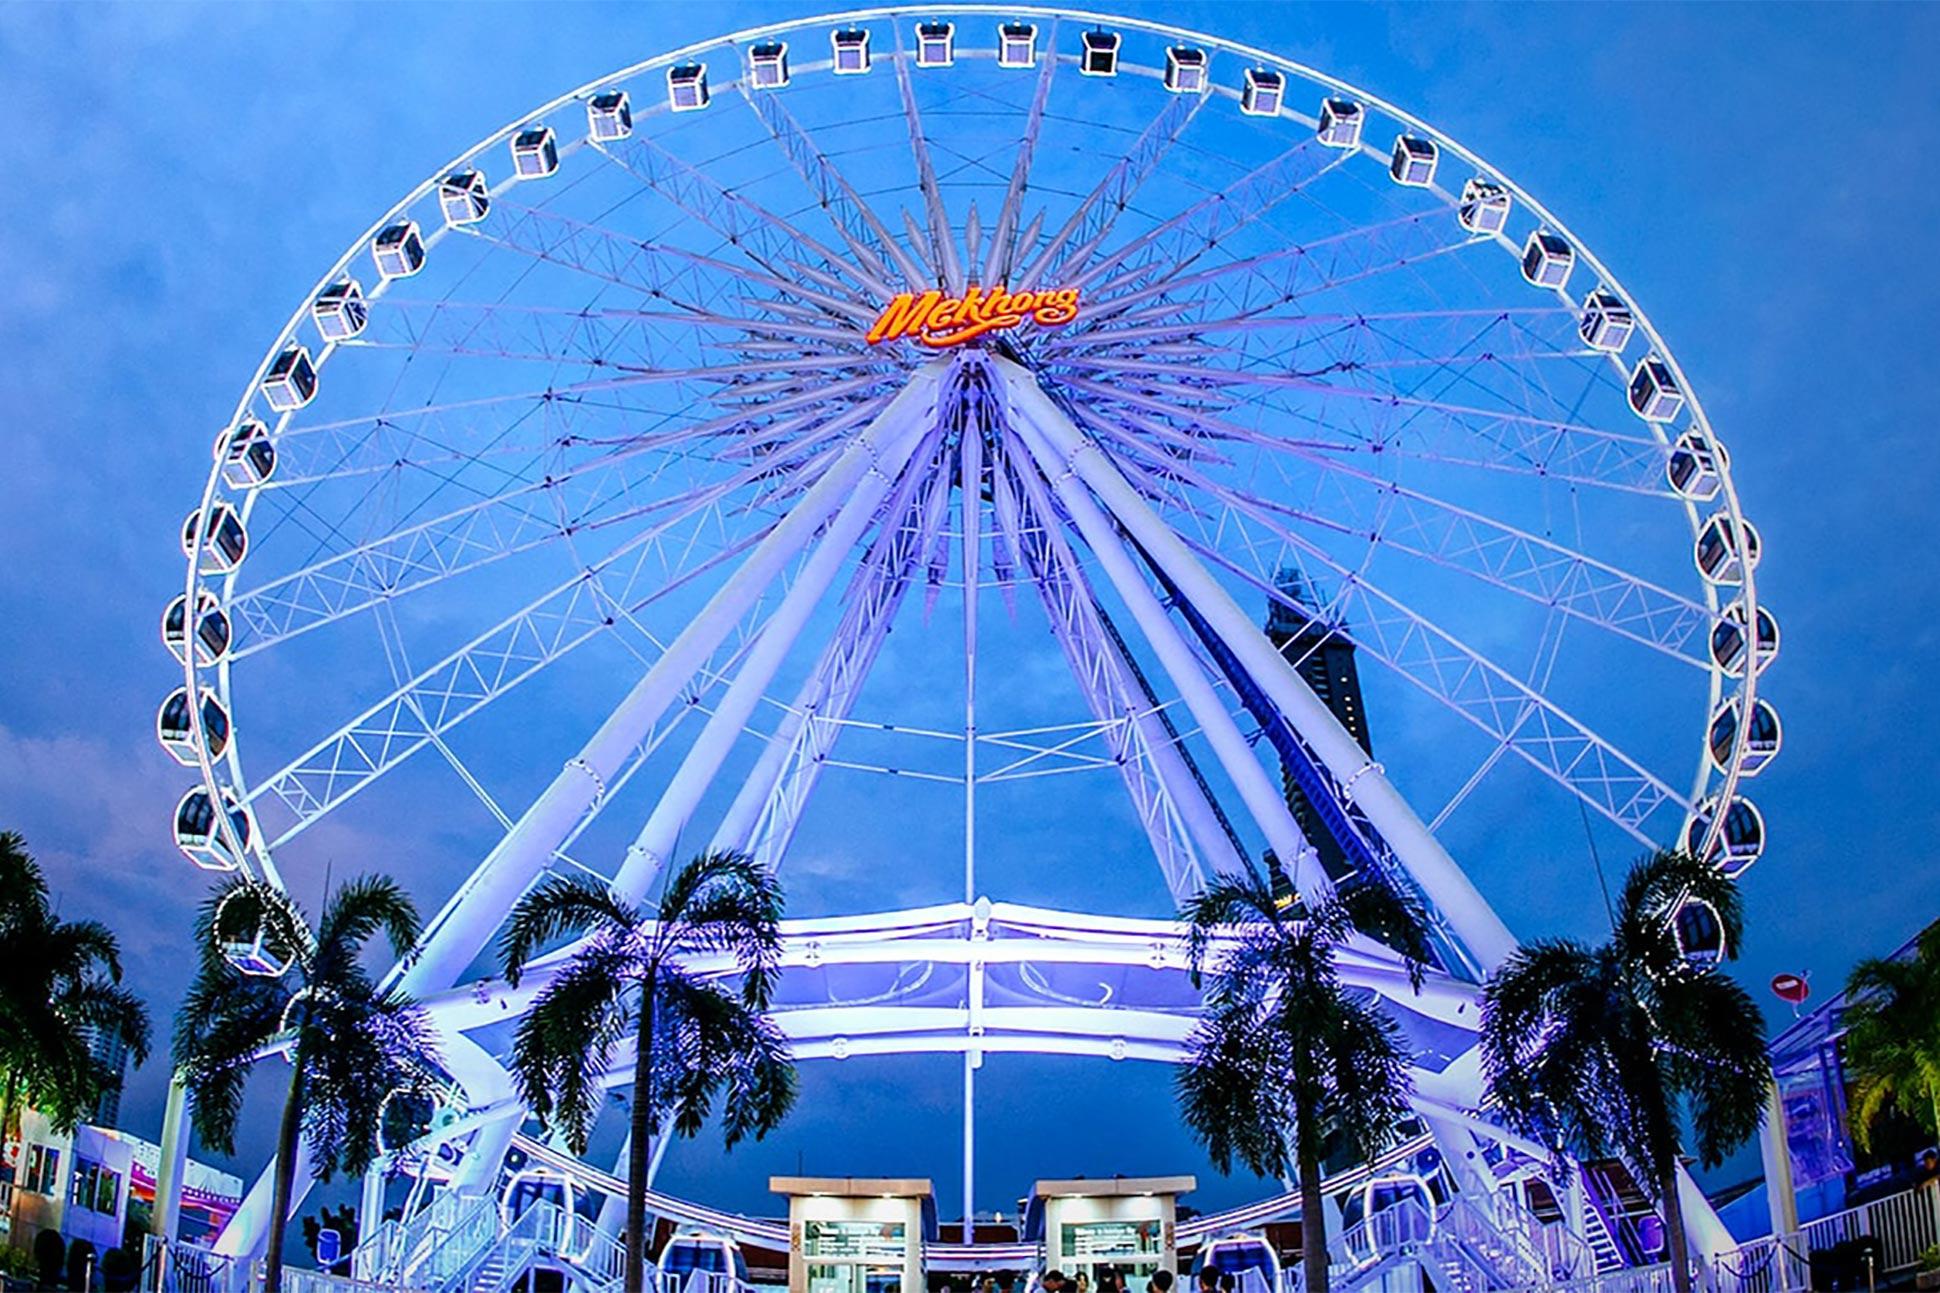 The ferris wheel at Asiatique The Riverfront, Bangkok, Thailand